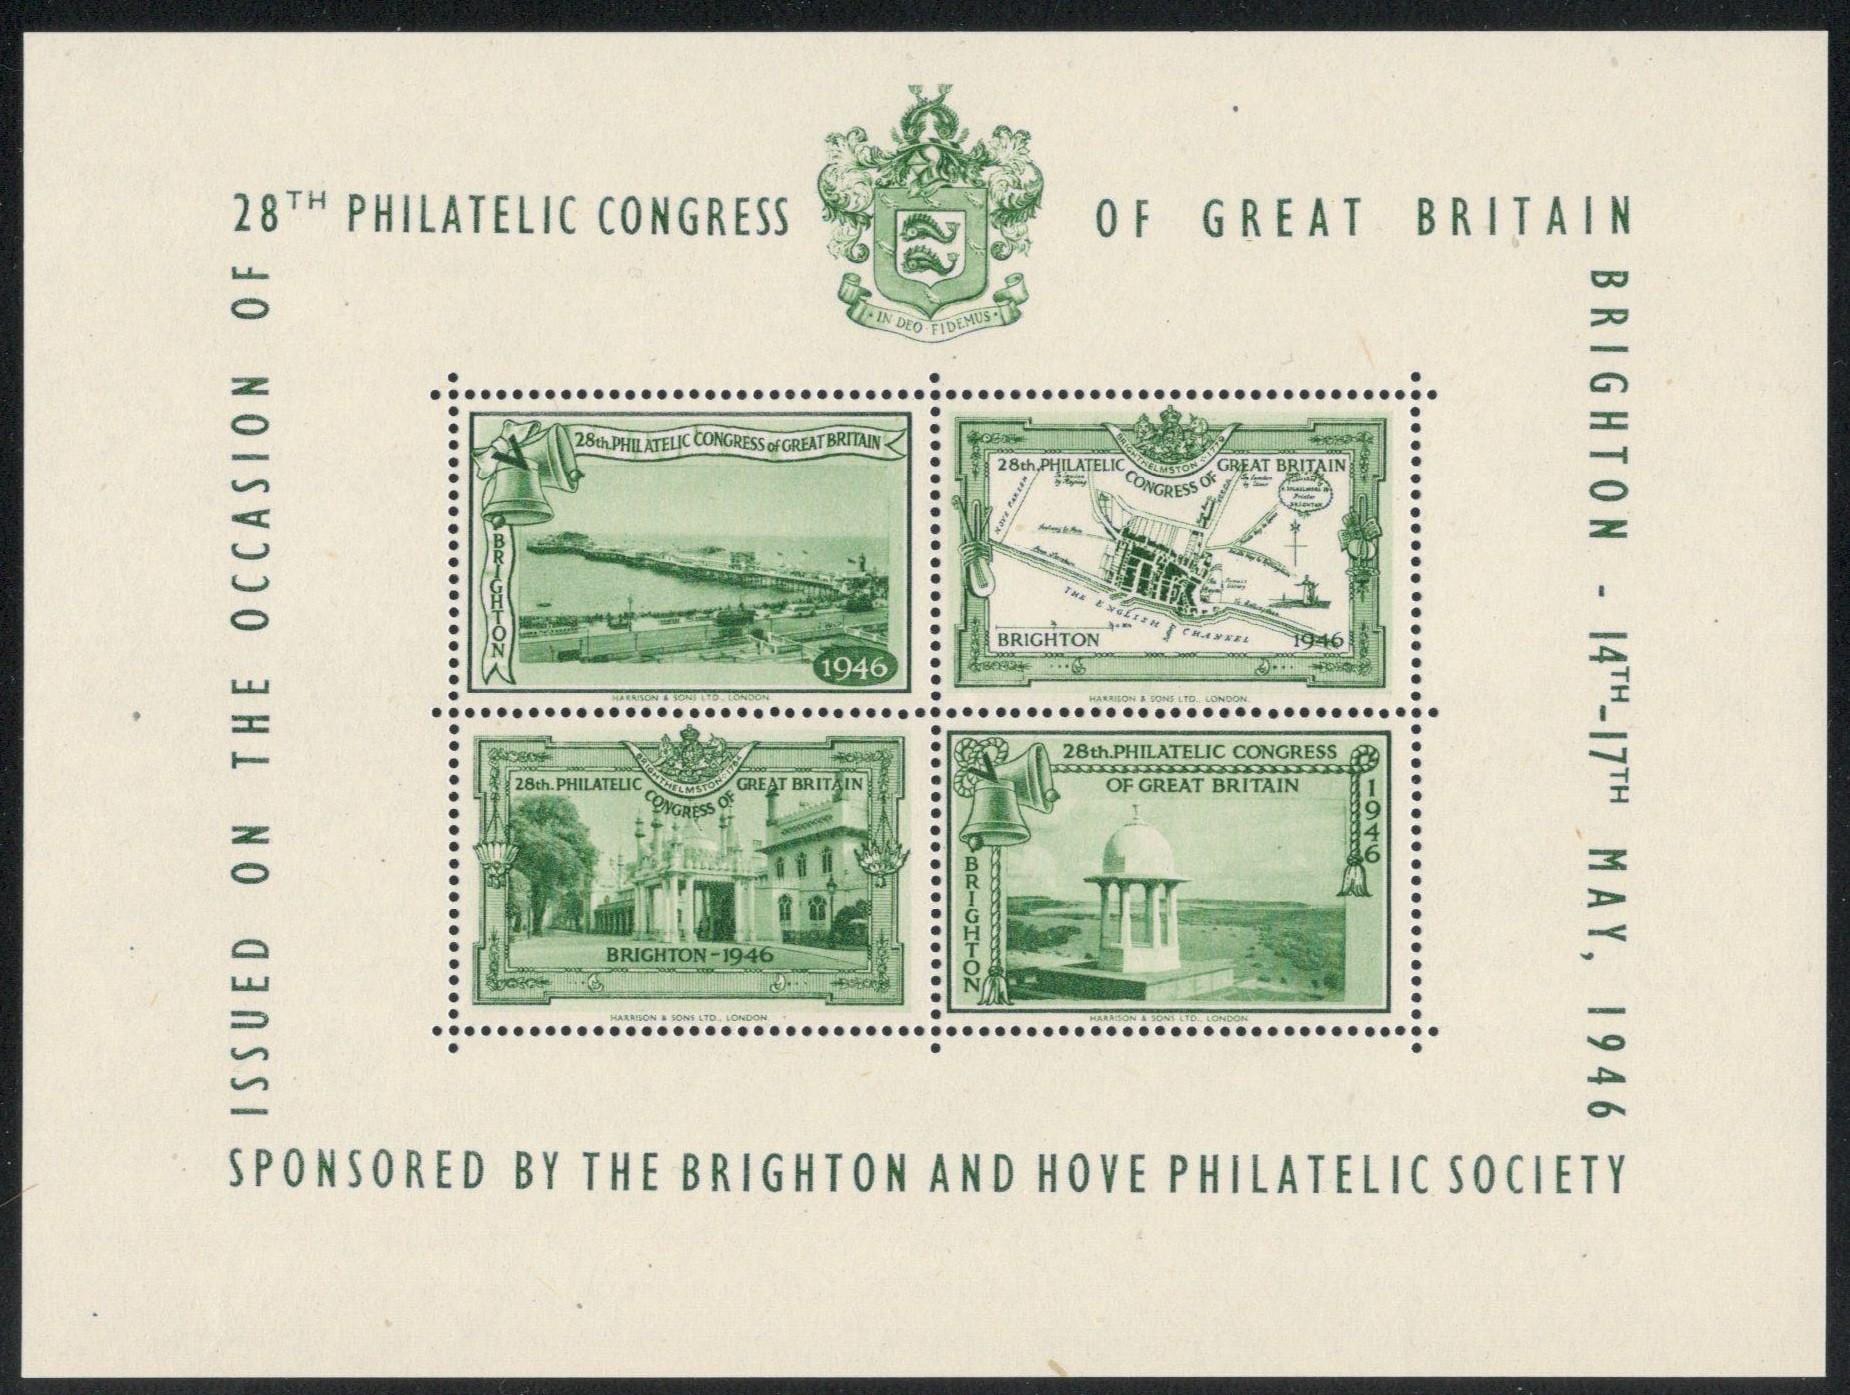 Lot 16 - 1946 BRIGHTON PHILATELIC CONGRESS OF GB - CONGRESS SOUVENIR MINIATURE SHEETS OF LABELS MNH